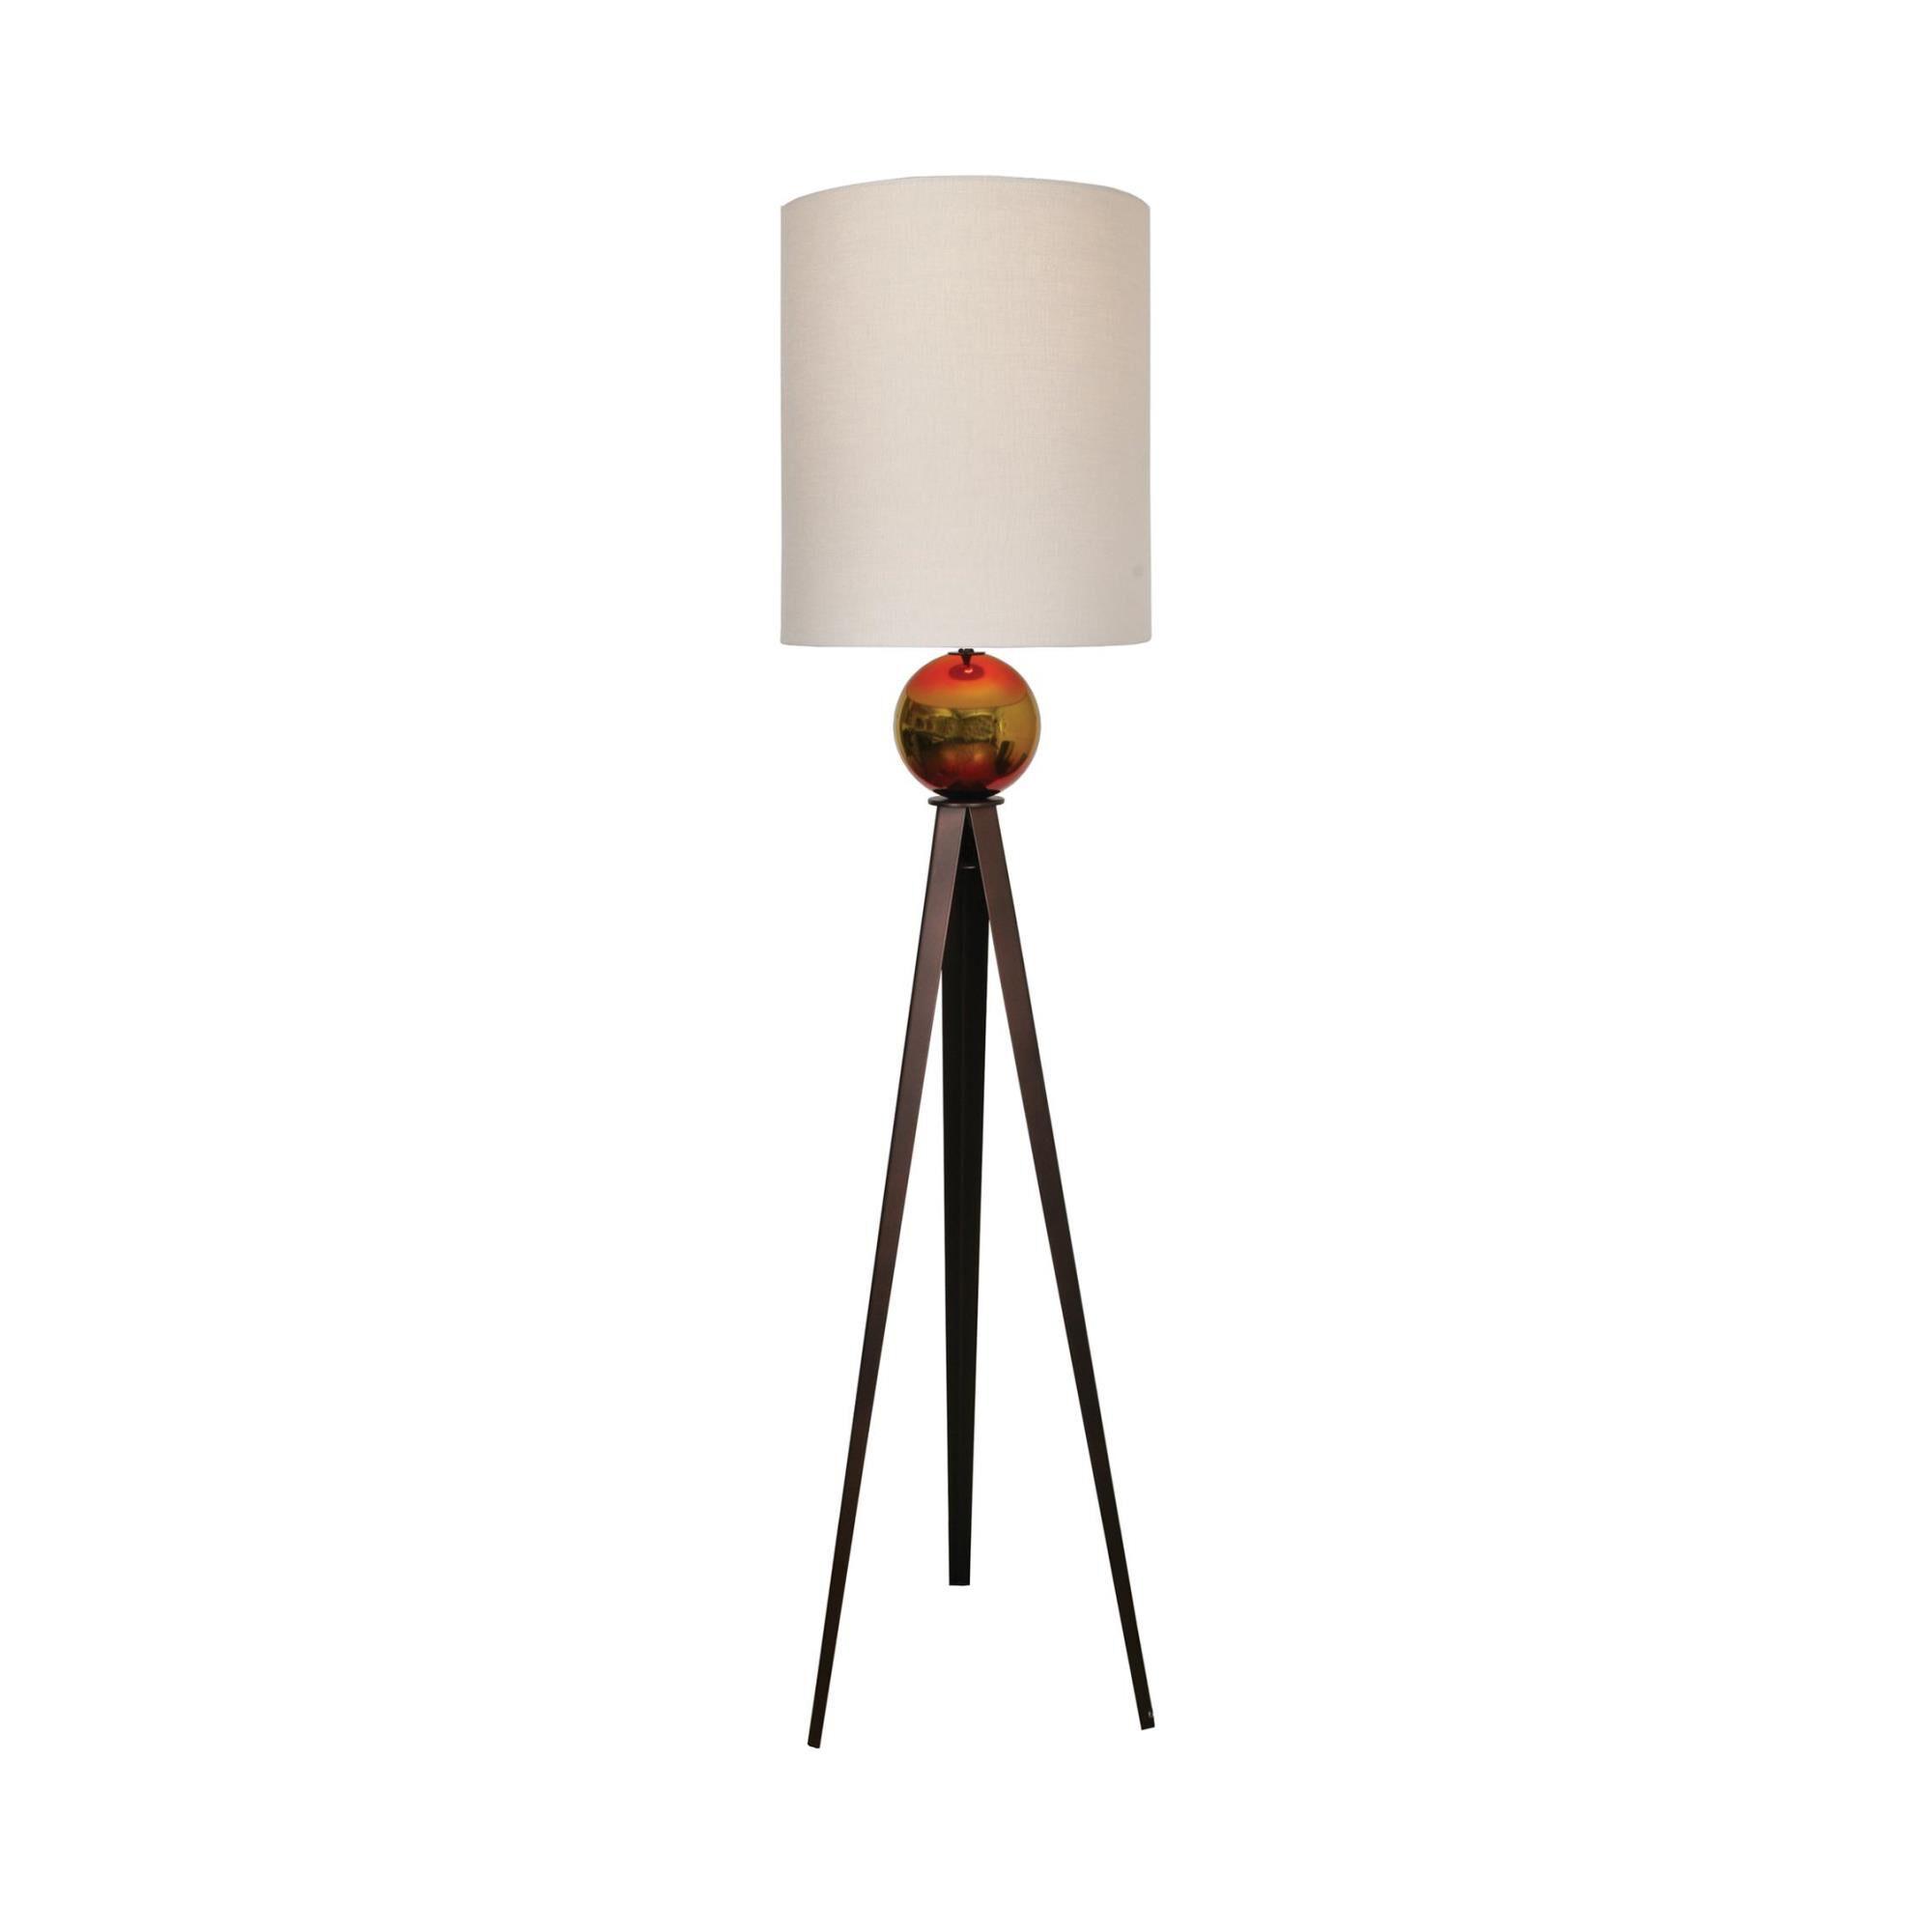 It Works 72 Inch Floor Lamp Capitol Lighting In 2021 Floor Lamp Lamp Flooring